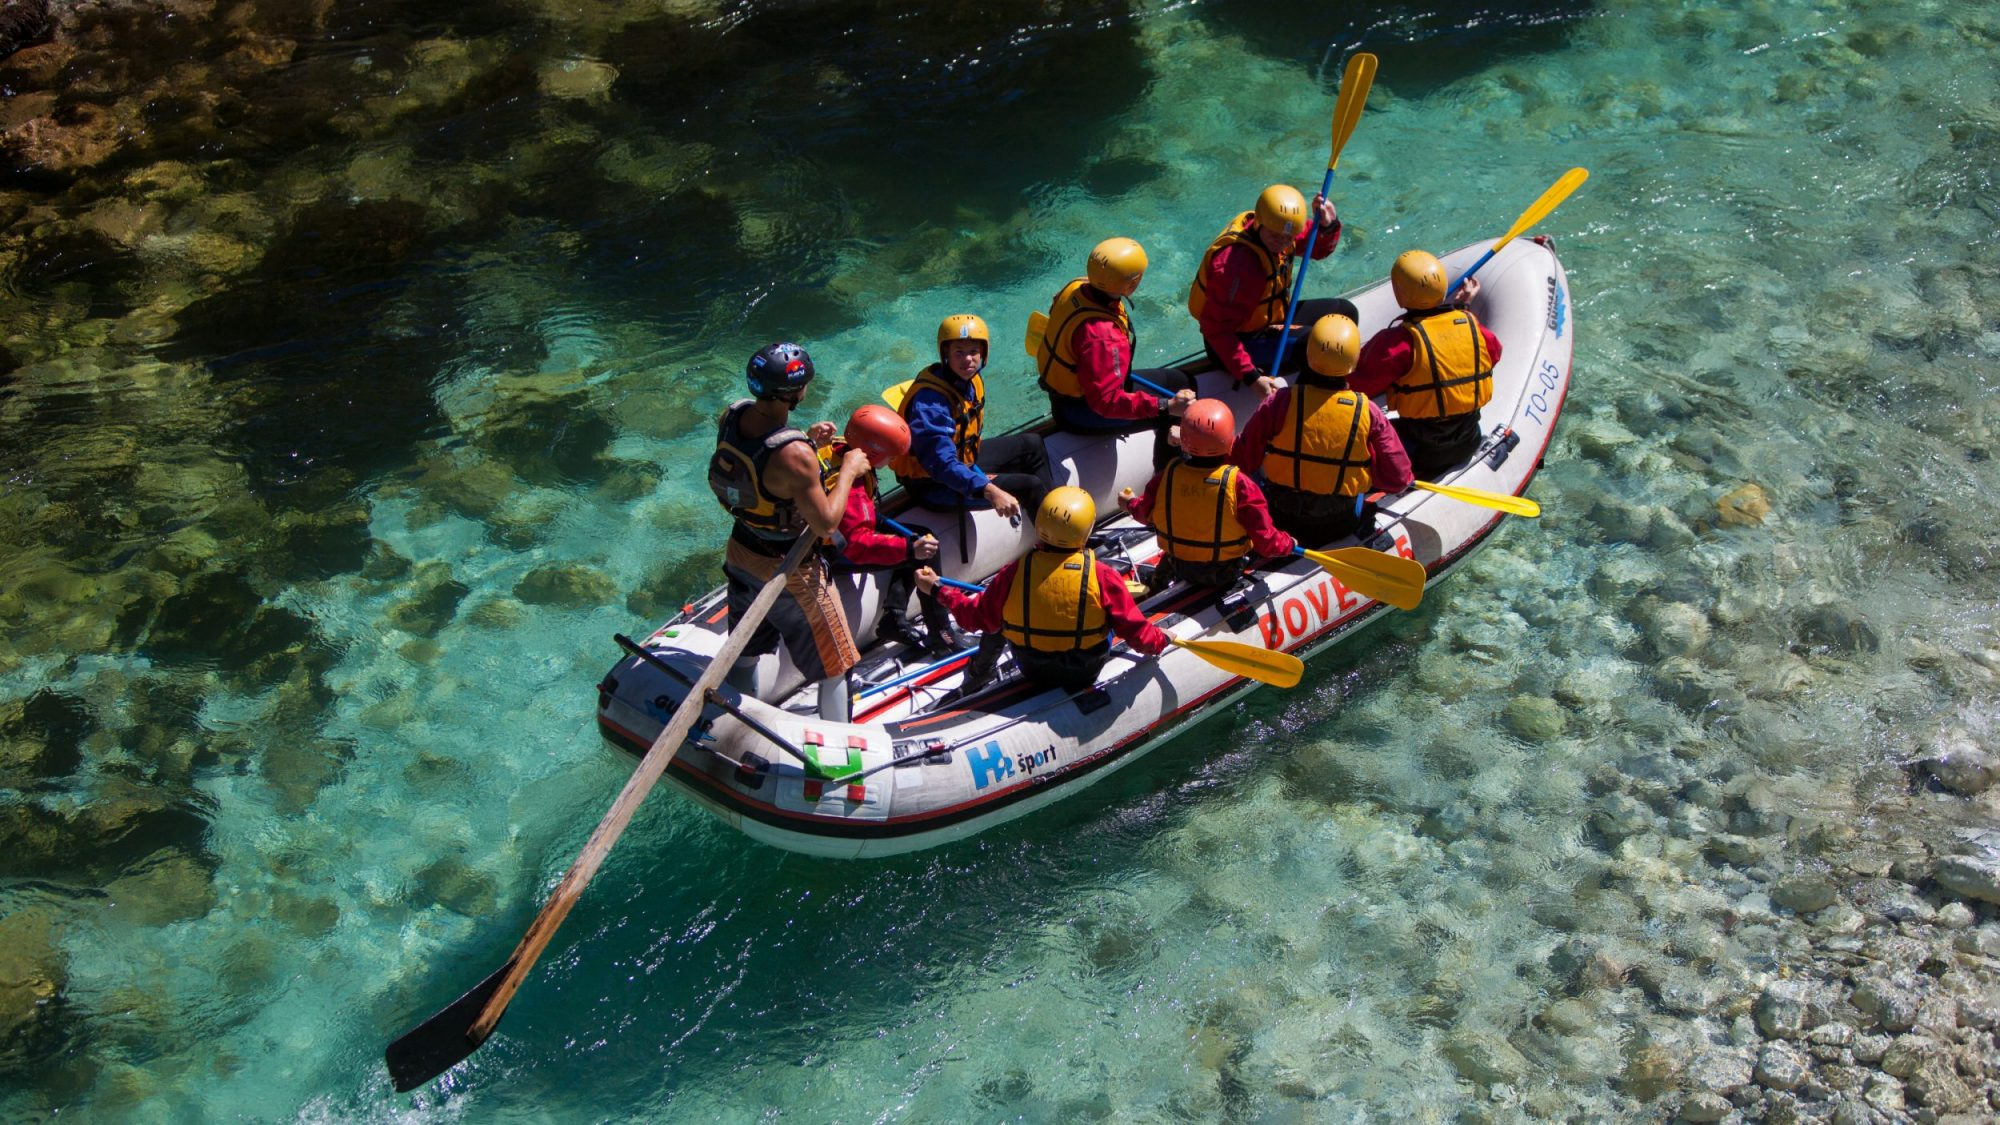 bovec-rafting-team-slovenia-e1494414828471